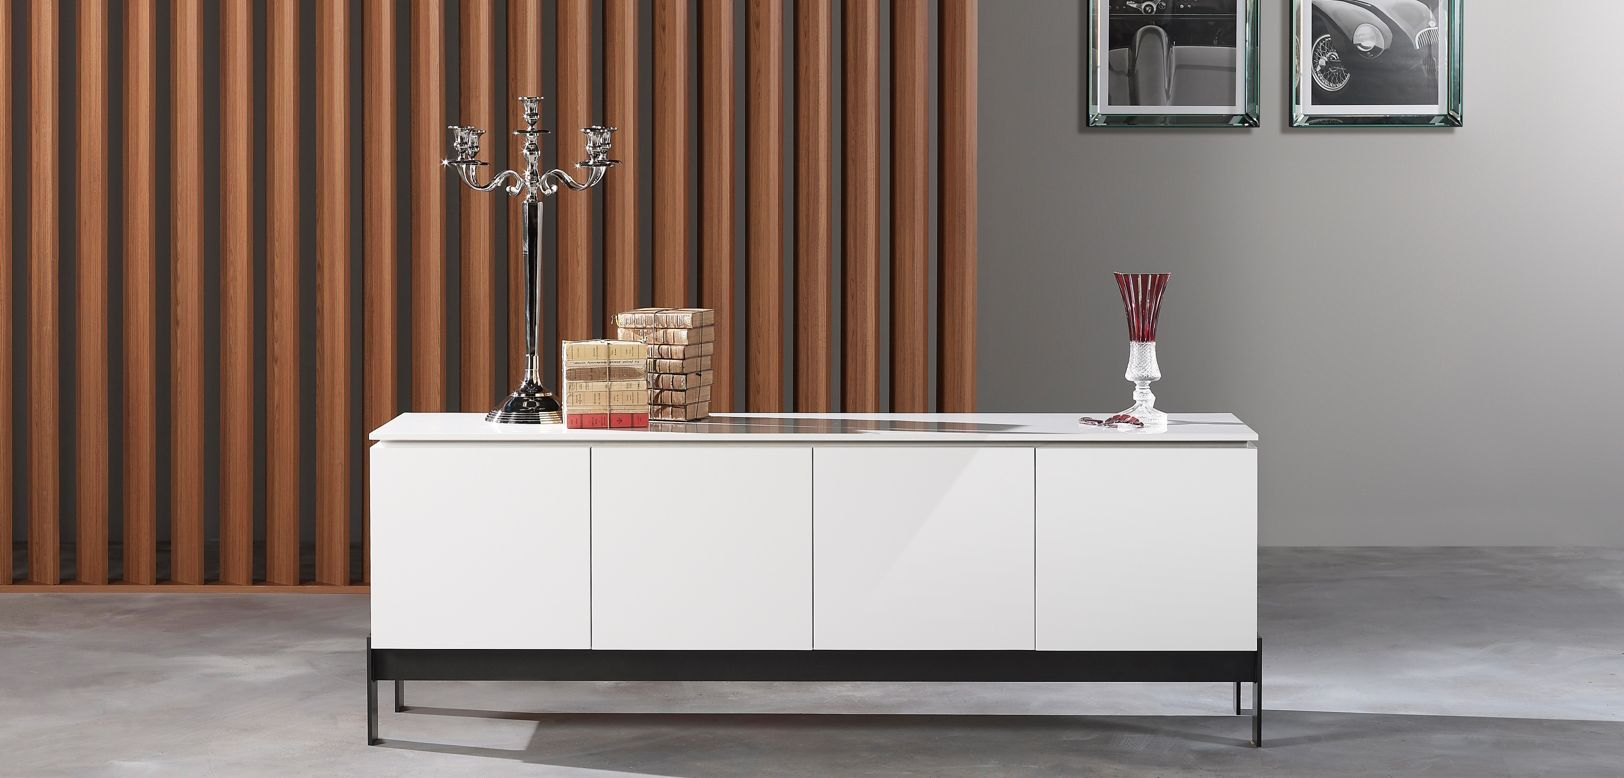 Coda sideboard roche bobois - Buffet contemporain roche bobois ...